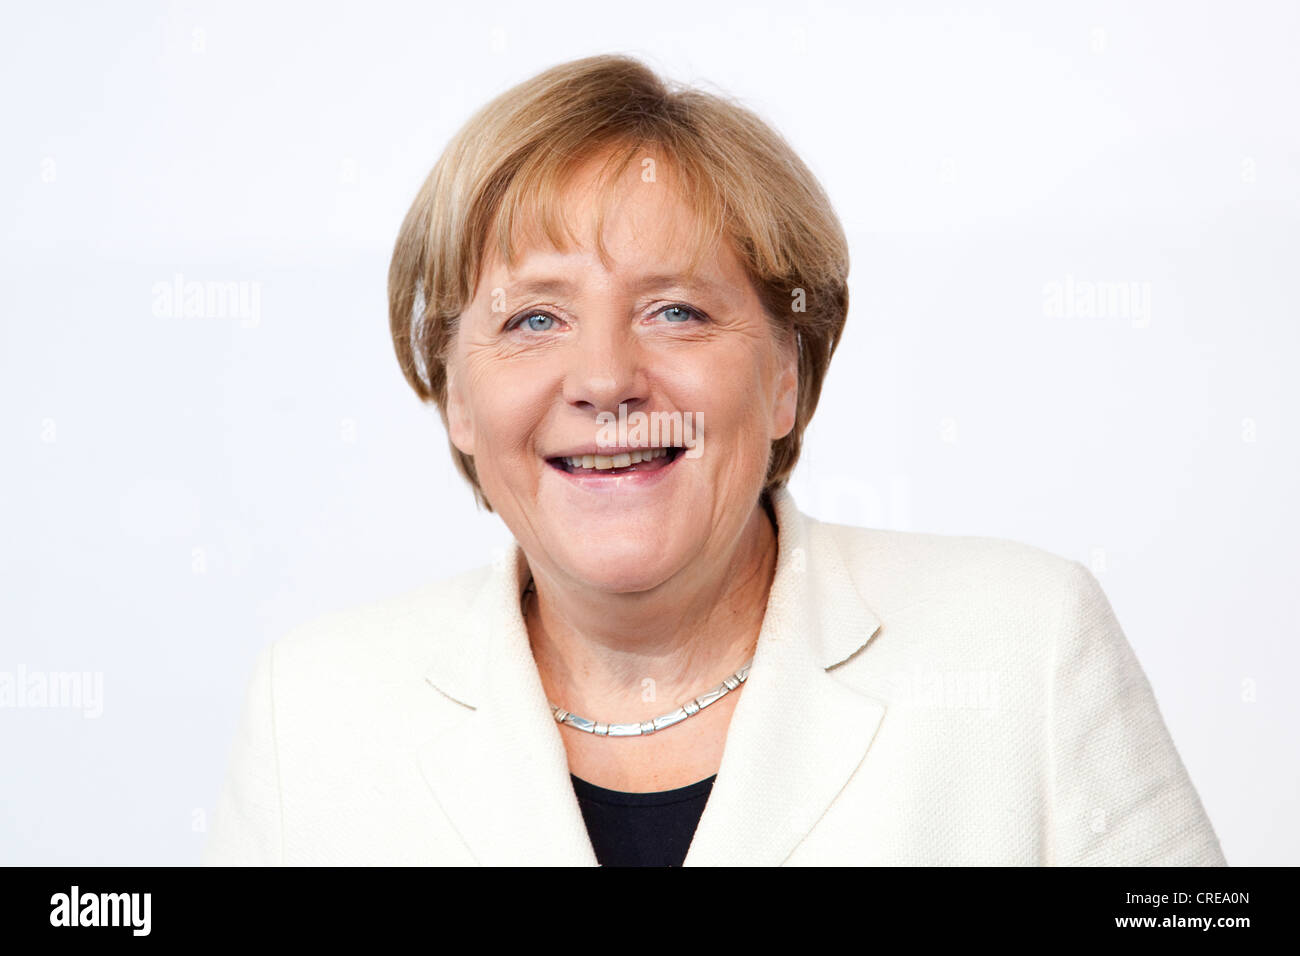 Angela Merkel, Chancellor of Germany, CDU, at BDI day of German Industry, 27 September 2011, Berlin, Germany, Europe - Stock Image